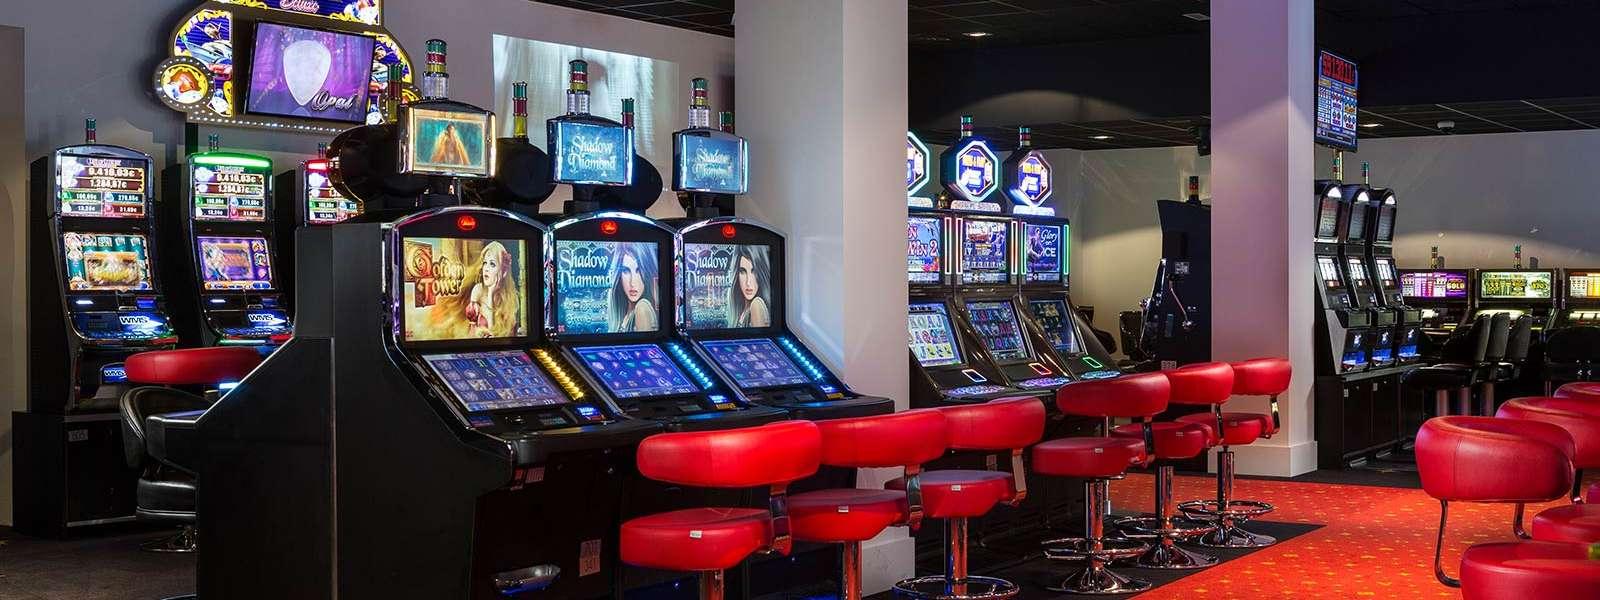 apps.tourisme-alsace.info/photos/niederbronn/photos/casino-5.jpg